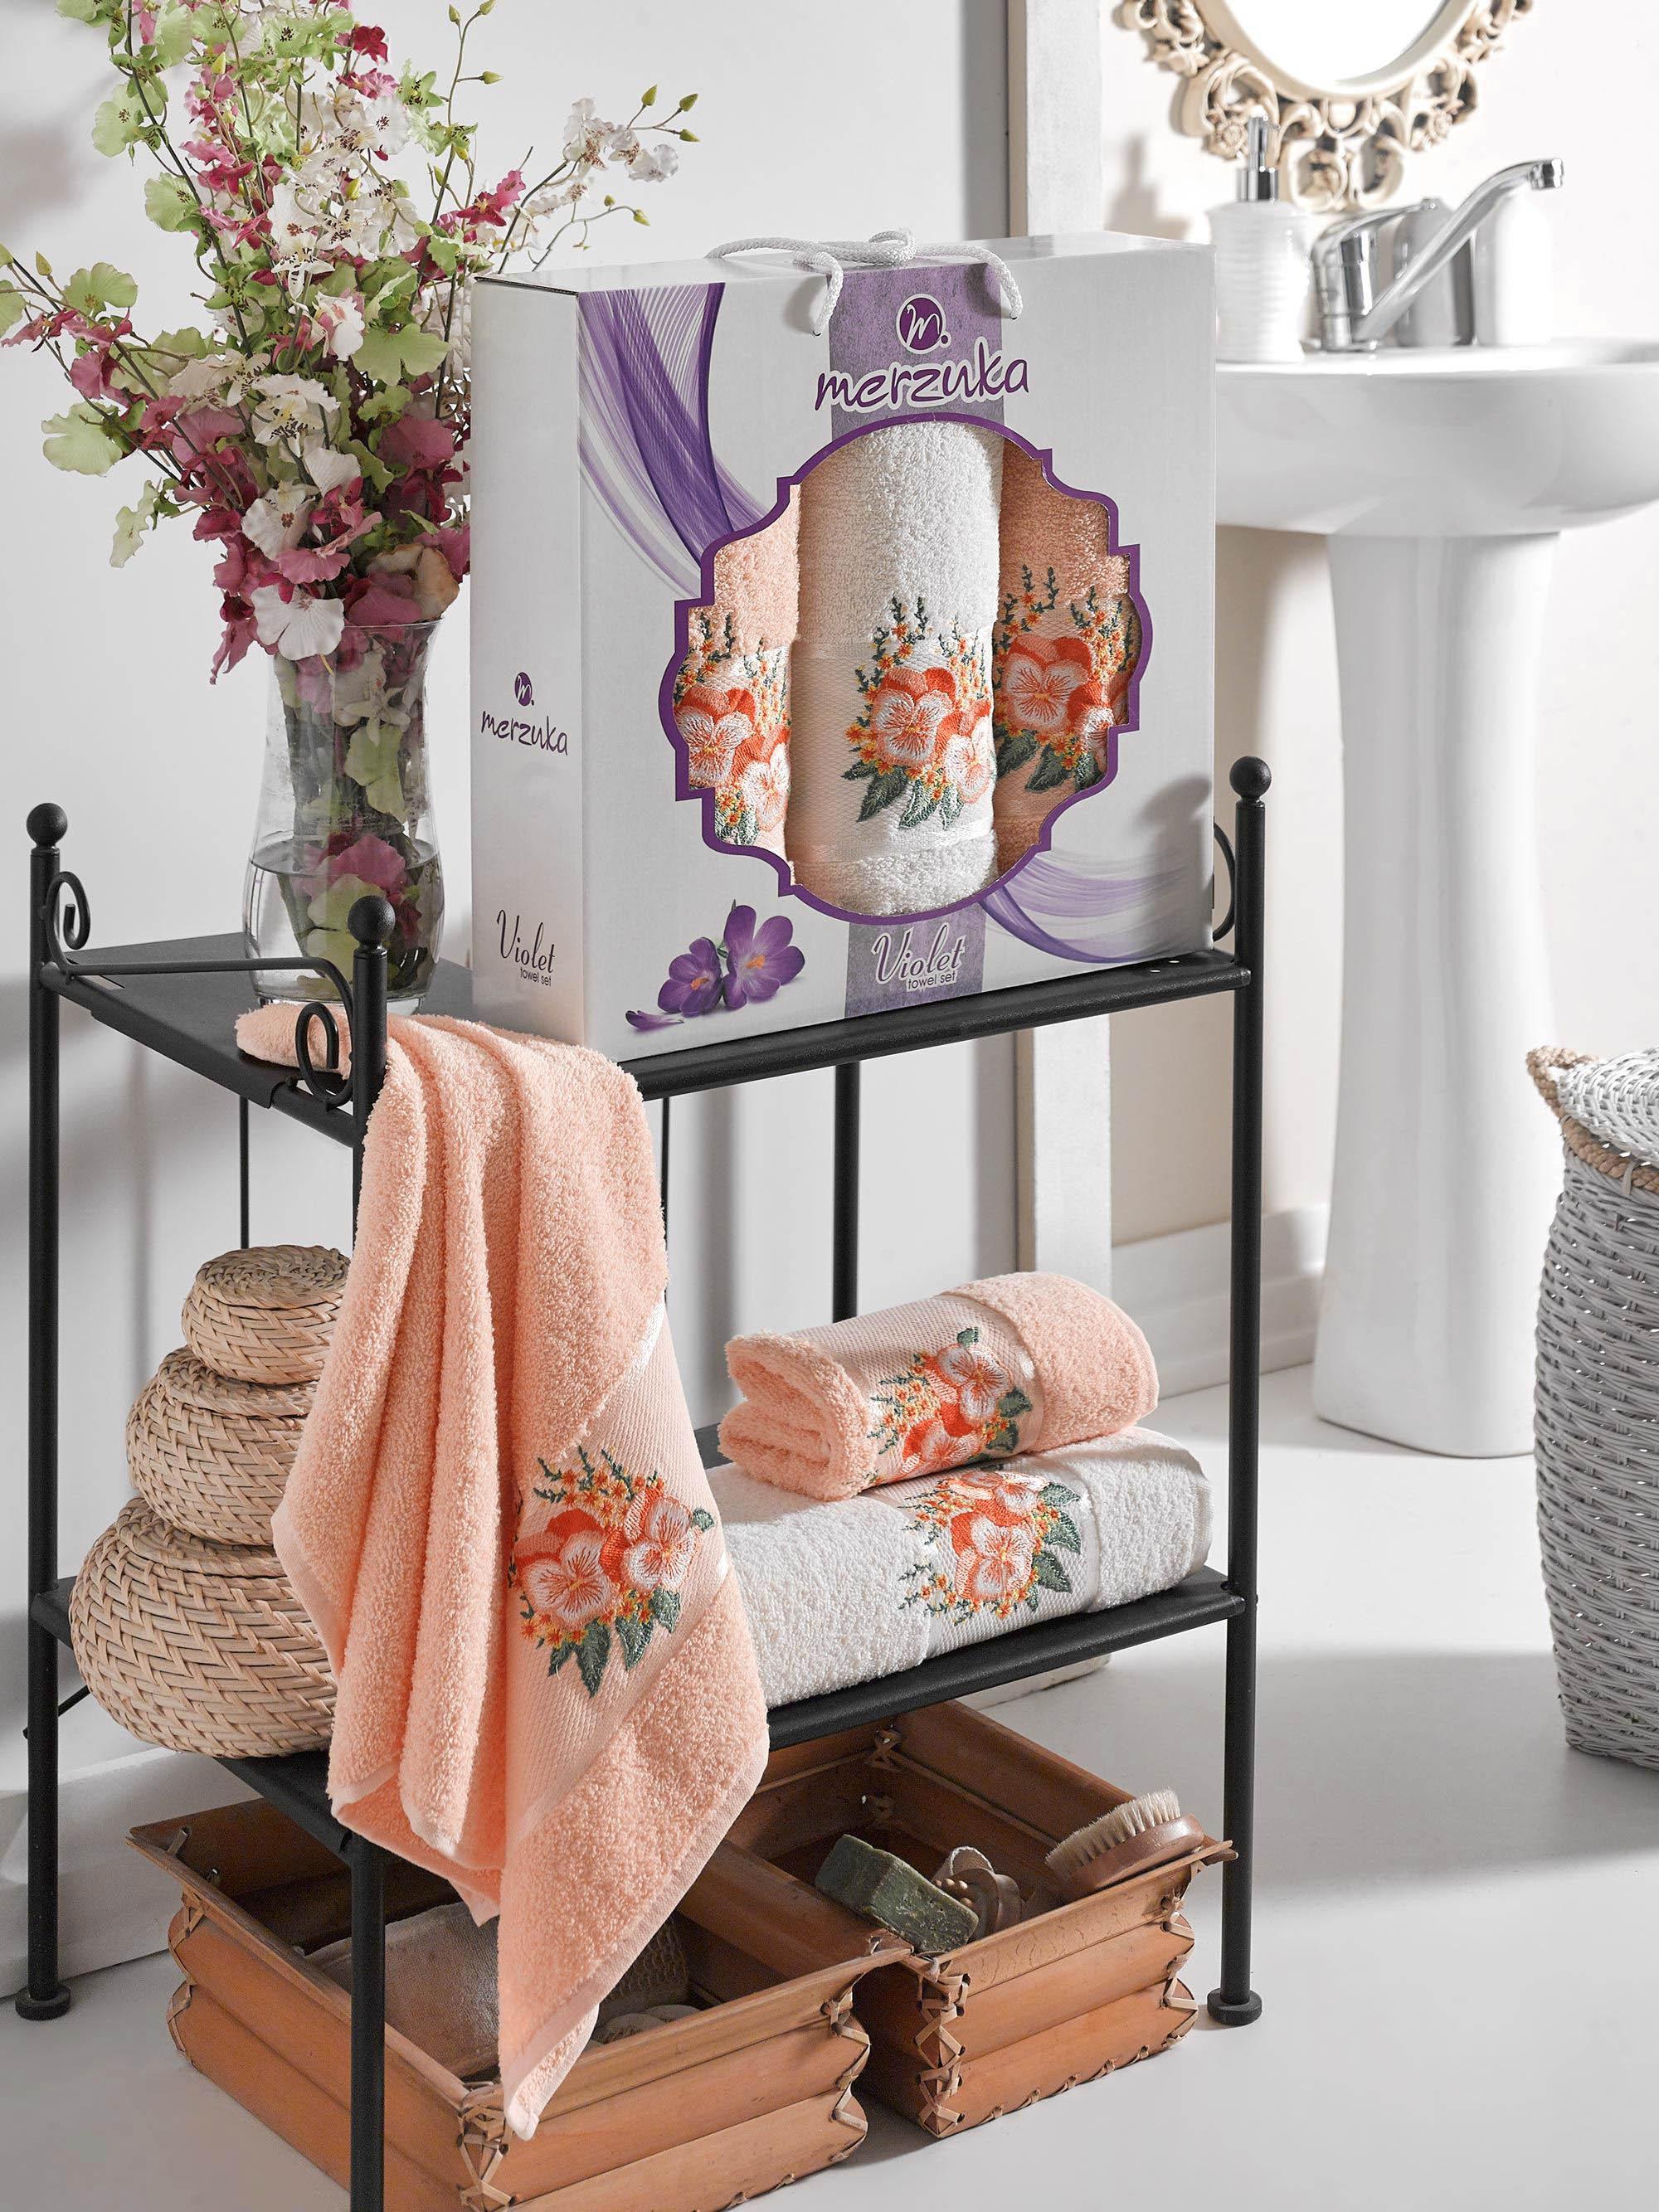 Полотенца Oran Merzuka Полотенце Violet Цвет: Оранжевый (50х80 см - 2 шт,70х130 см) оранжевый prime м 50х90 70х130 в коробке набор полотенец фиеста